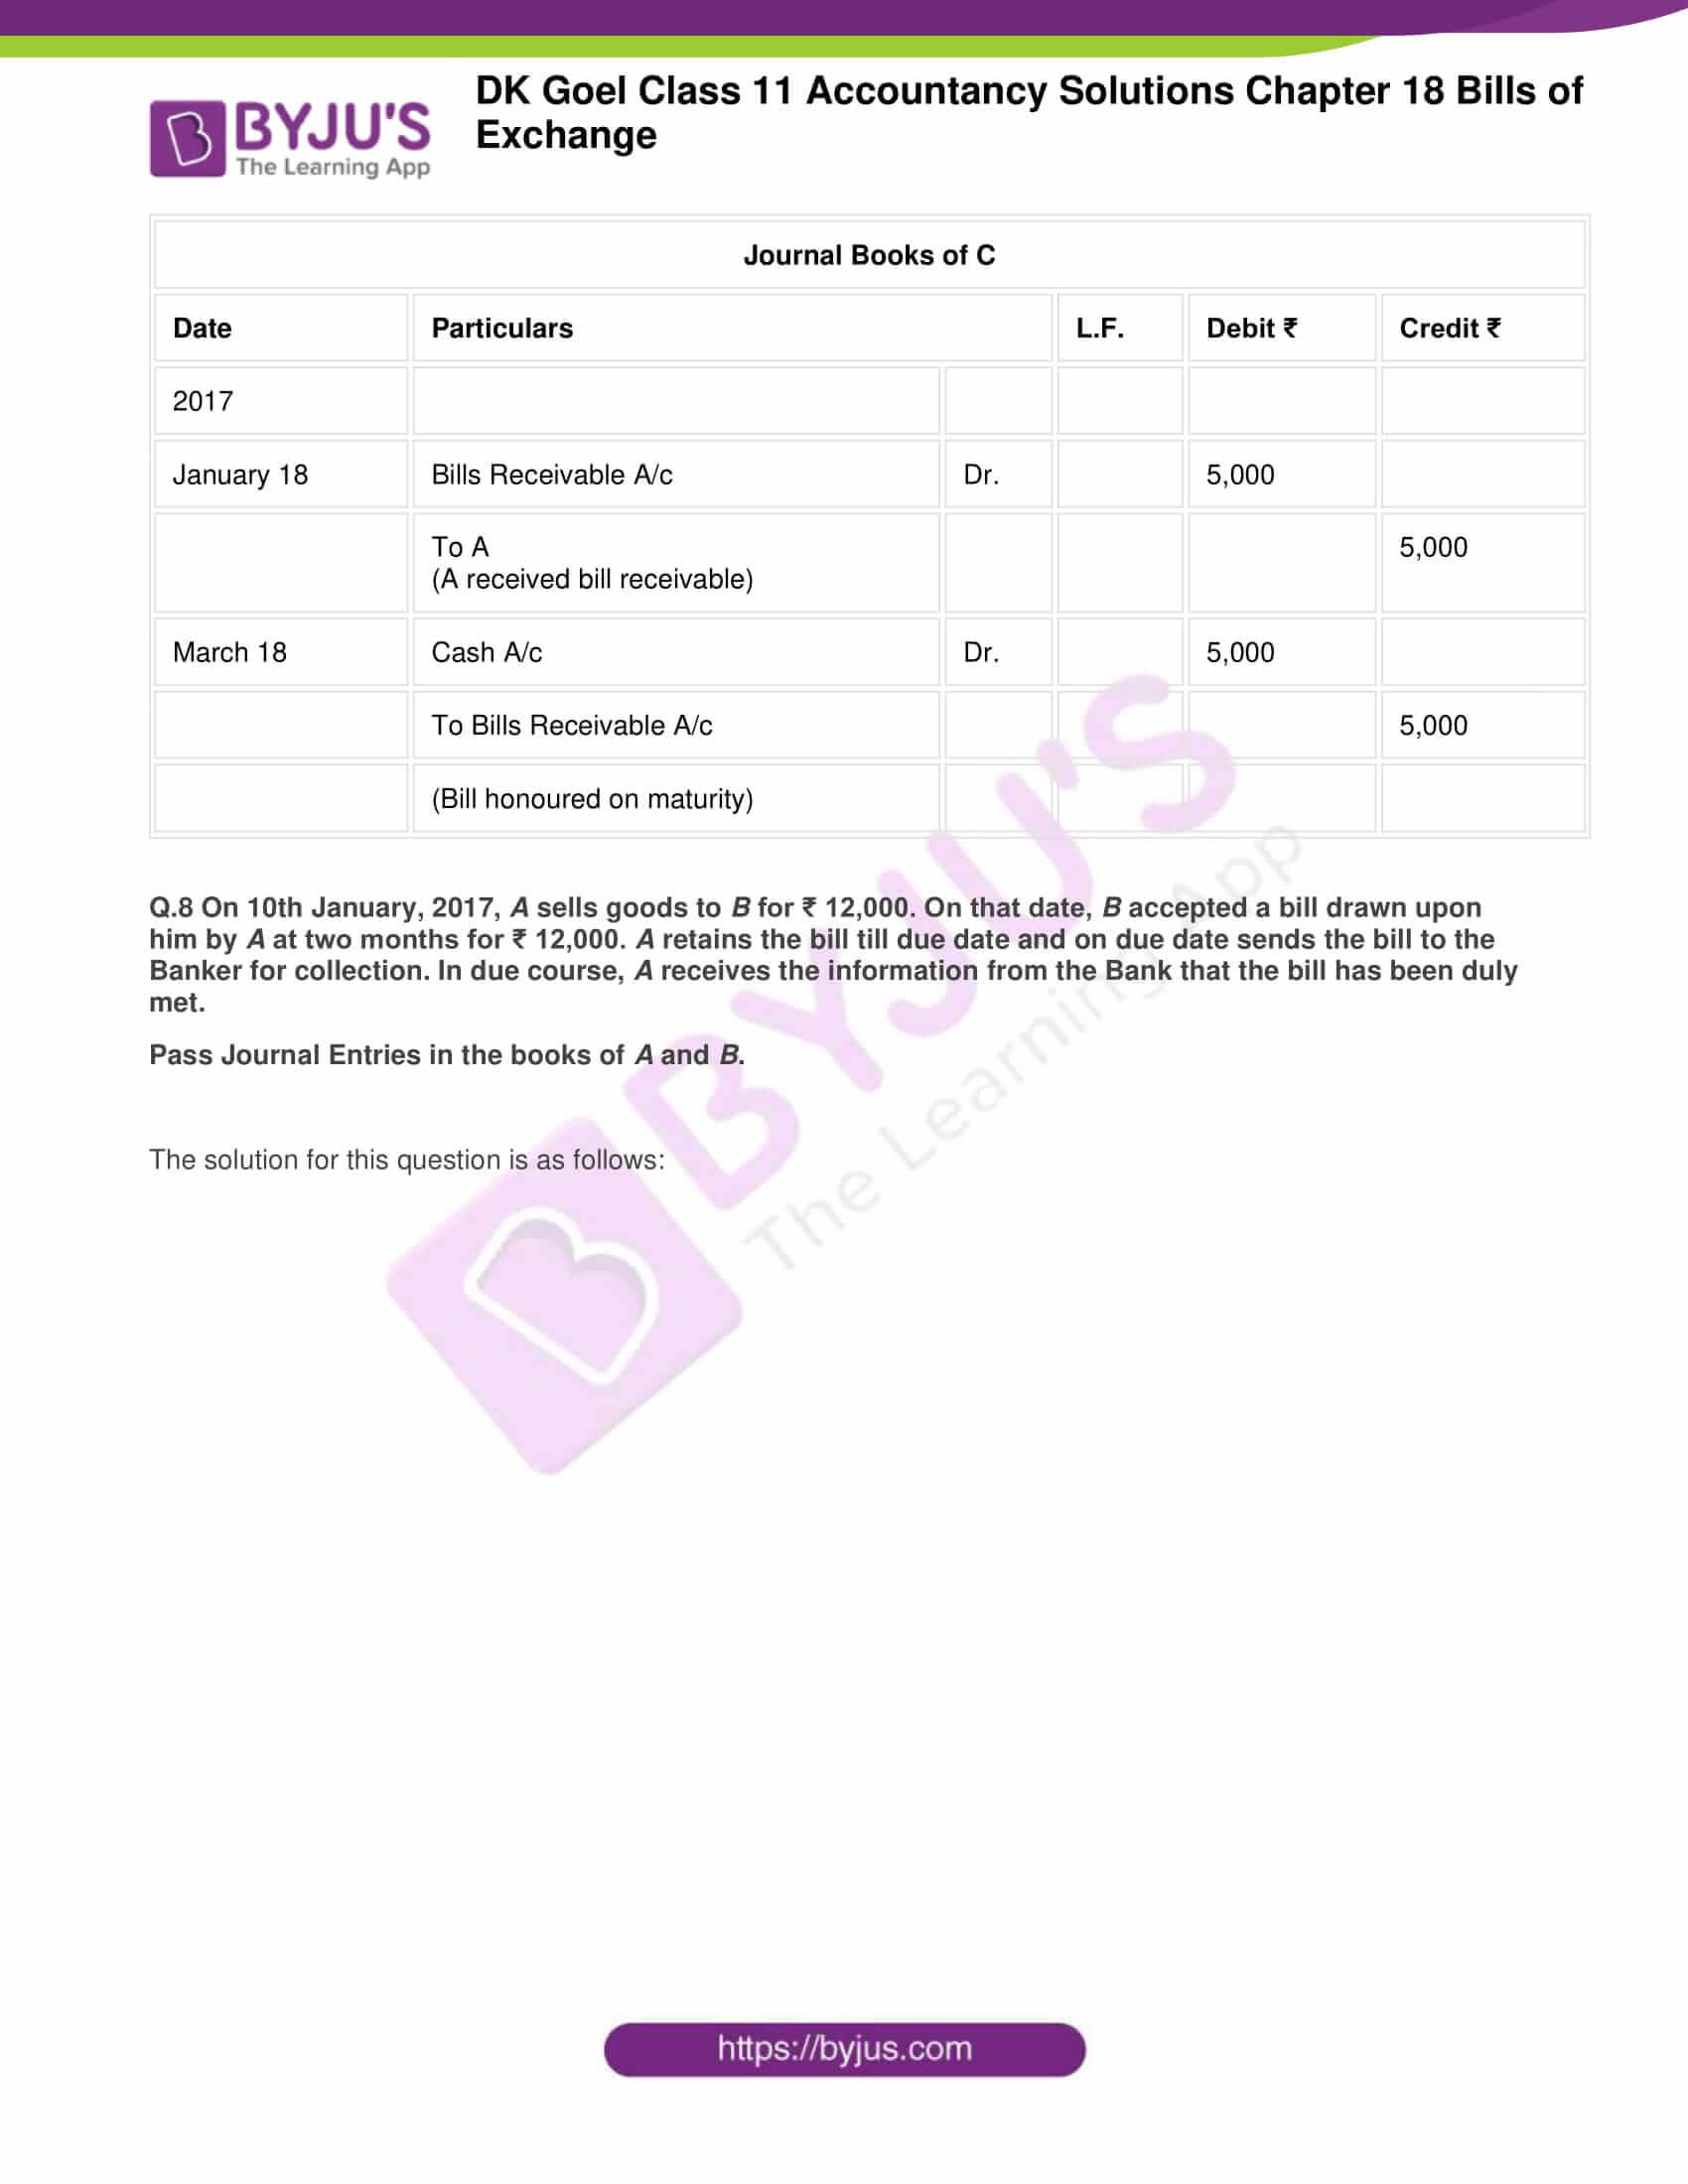 dk goel class 11 accountancy solutions chapter 18 012